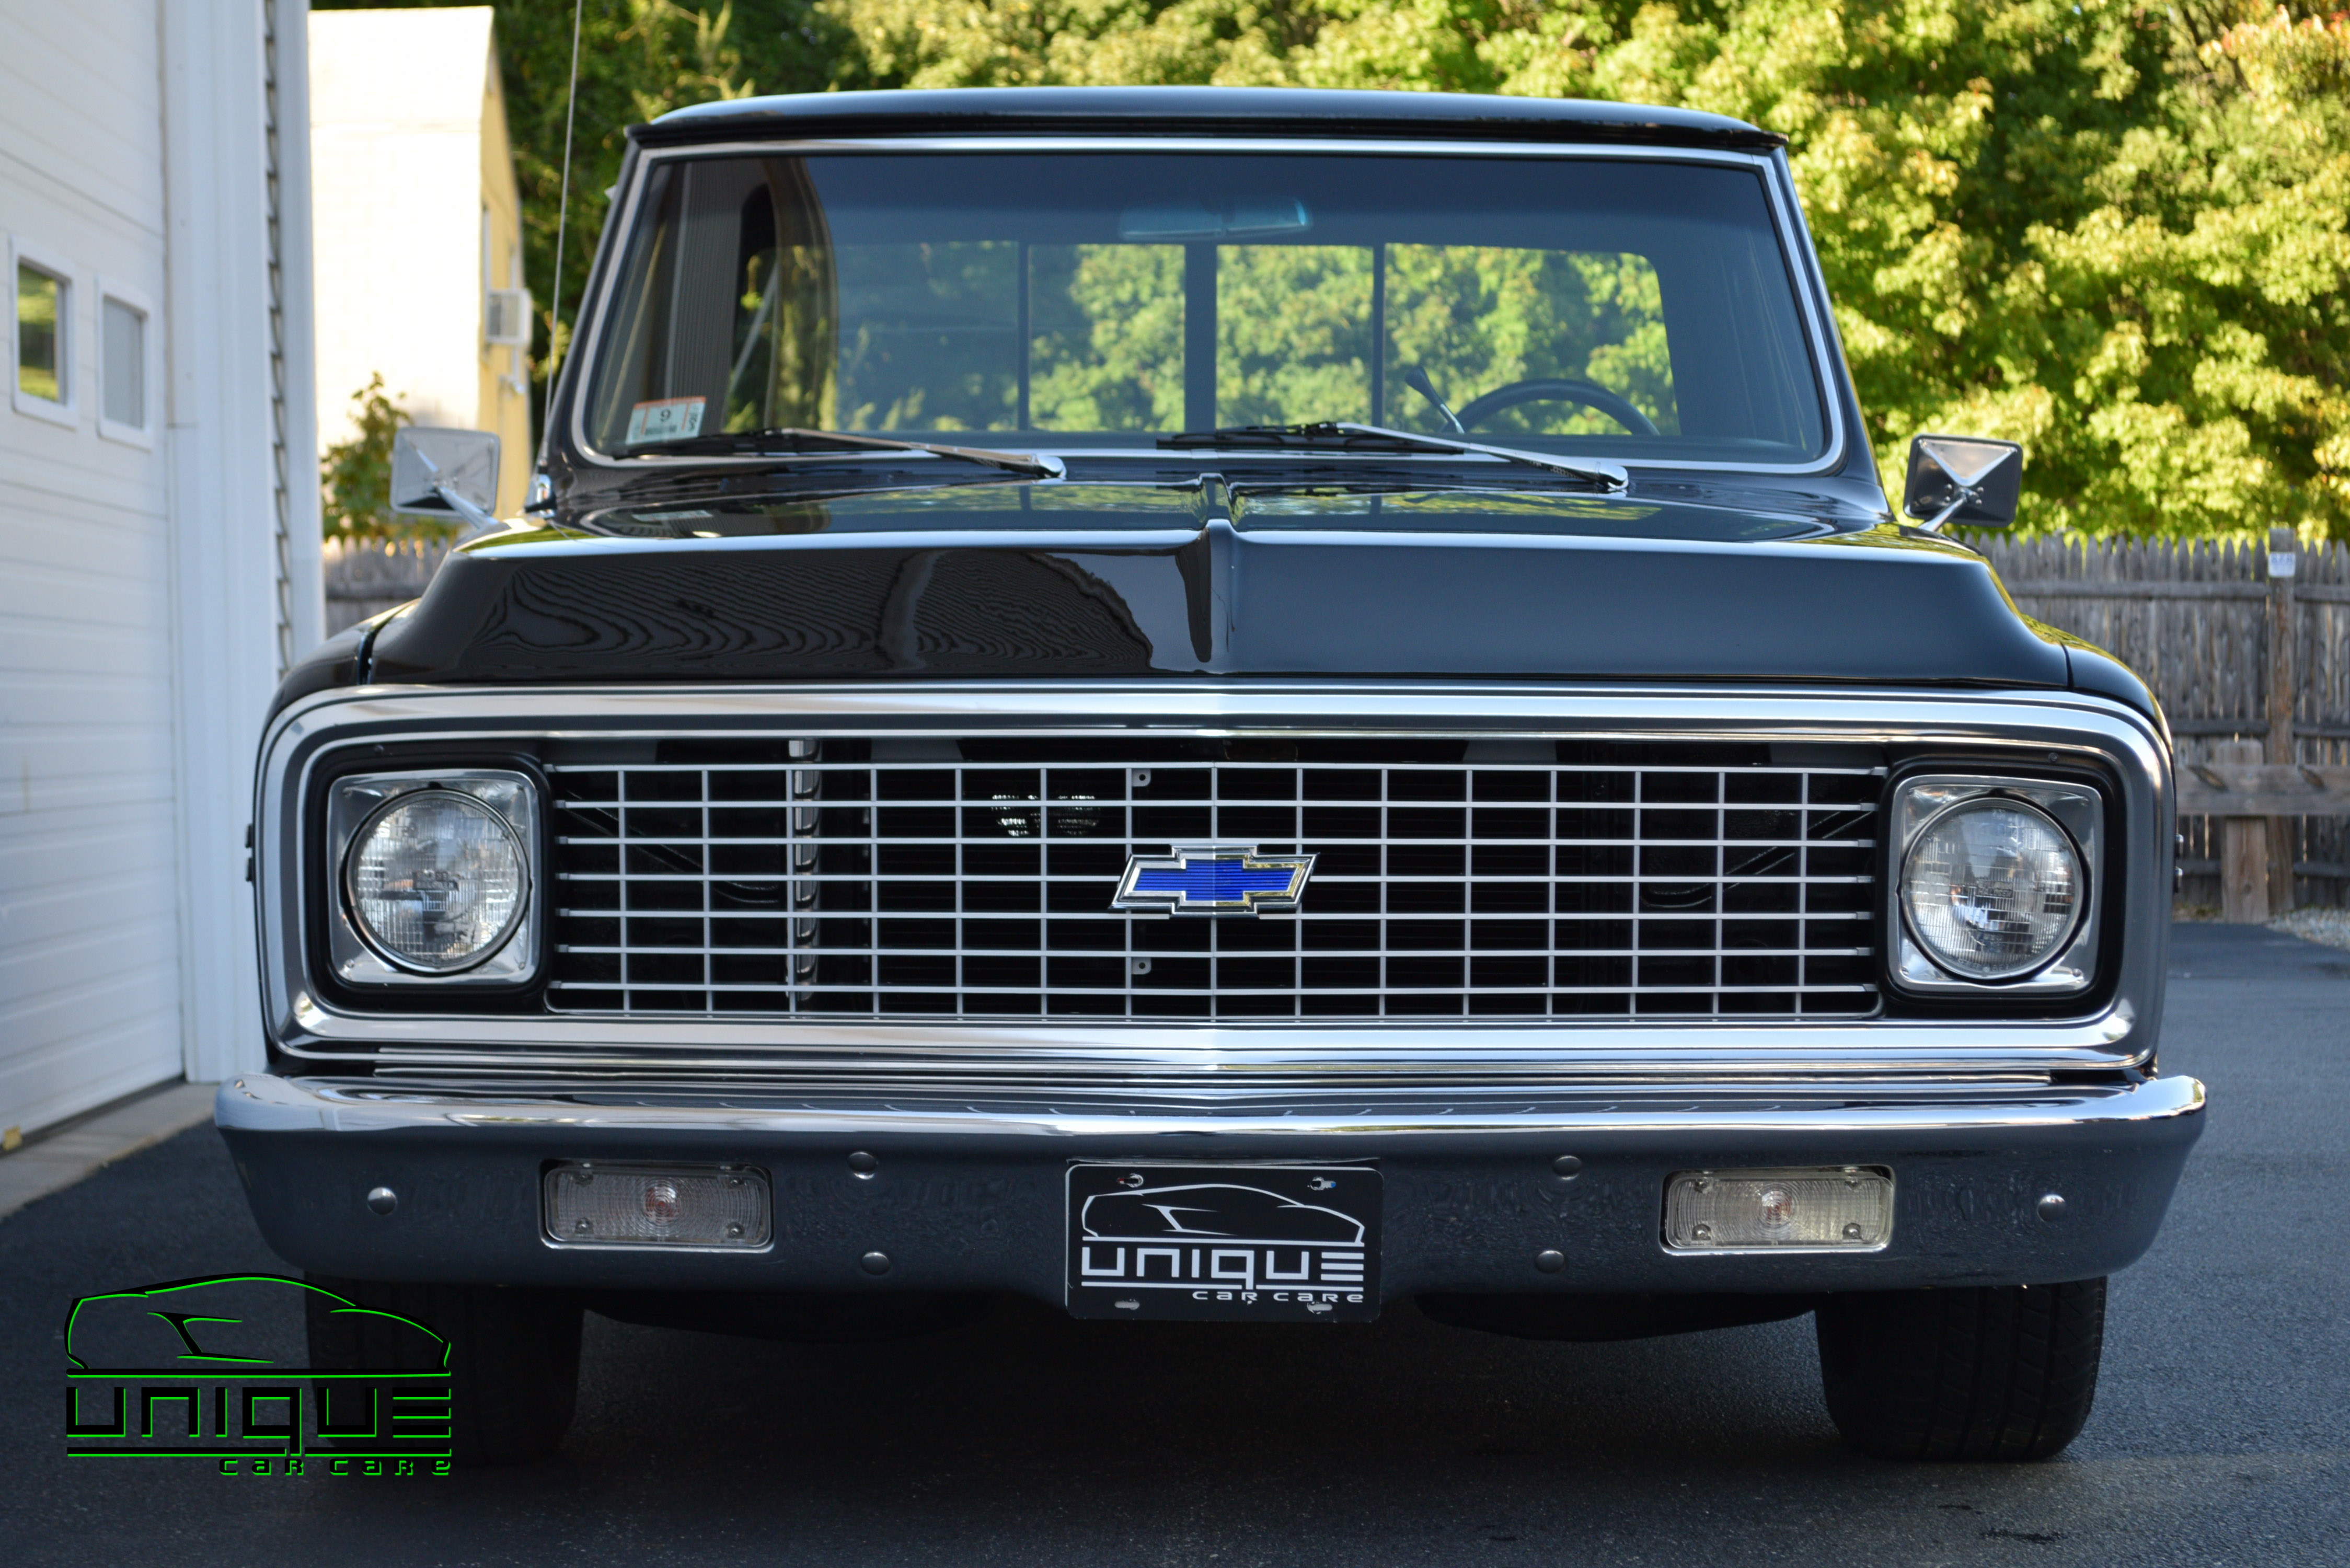 UCC_Custom 72' Chevy Pick up-64